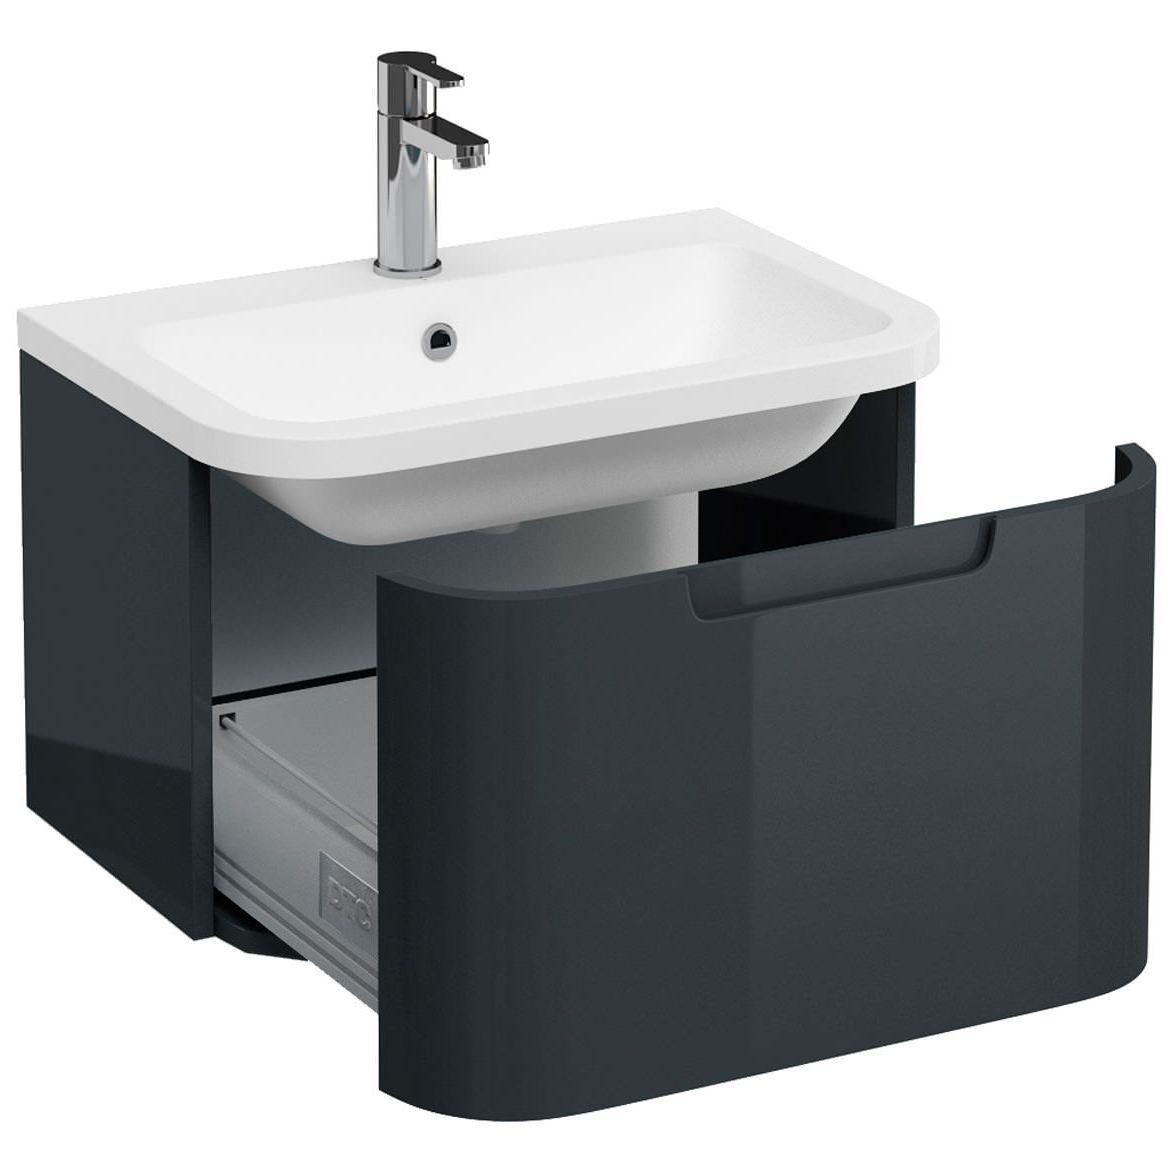 Britton Aqua Cabinets Compact White 600mm 1 Drawer Wall